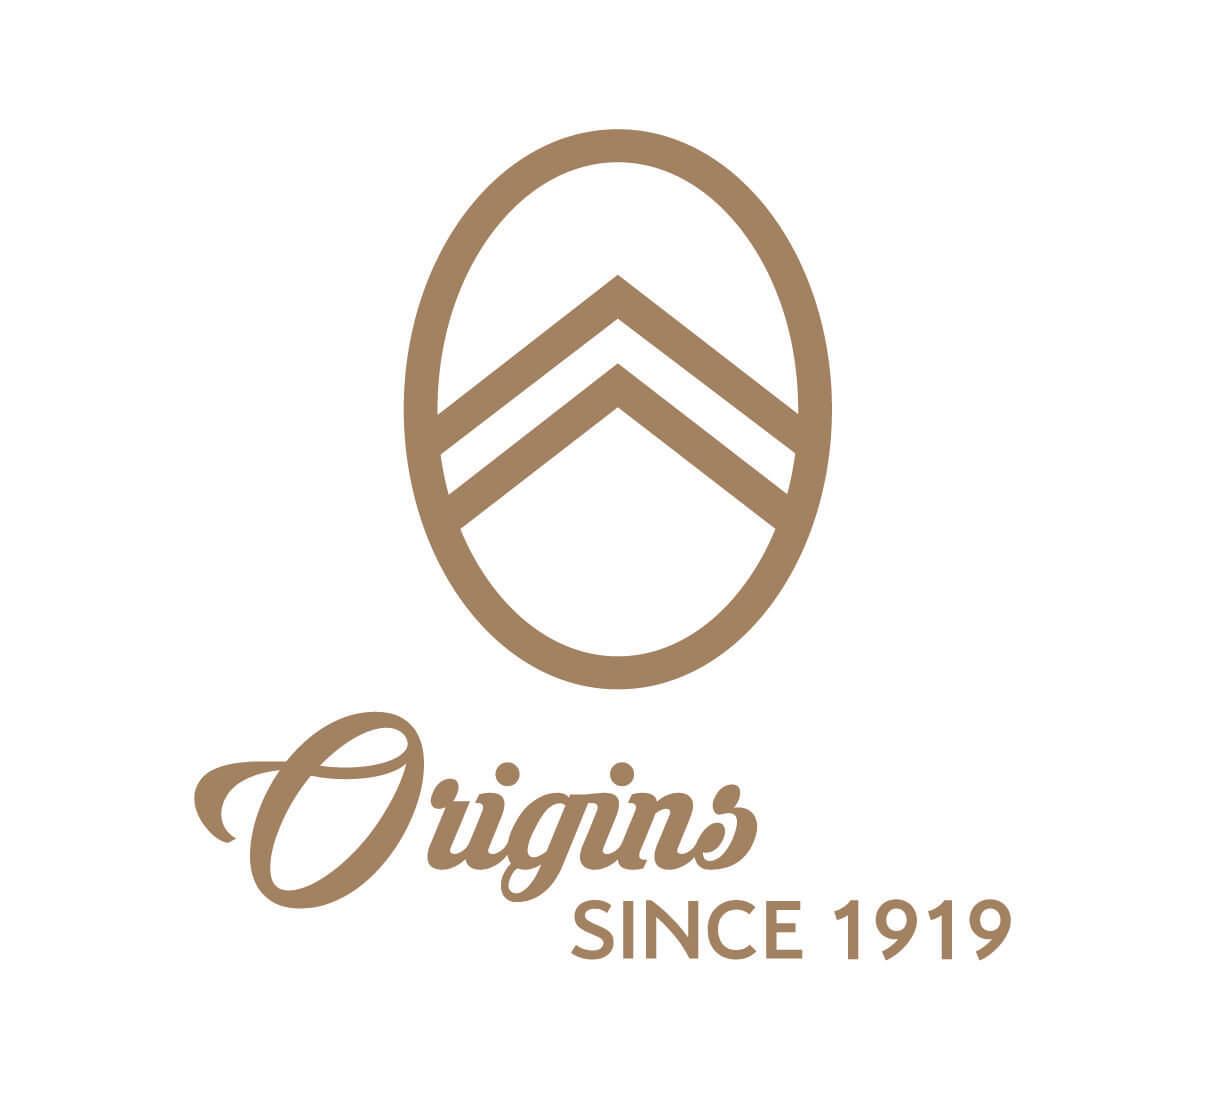 190328_CITROEN_Origins-1